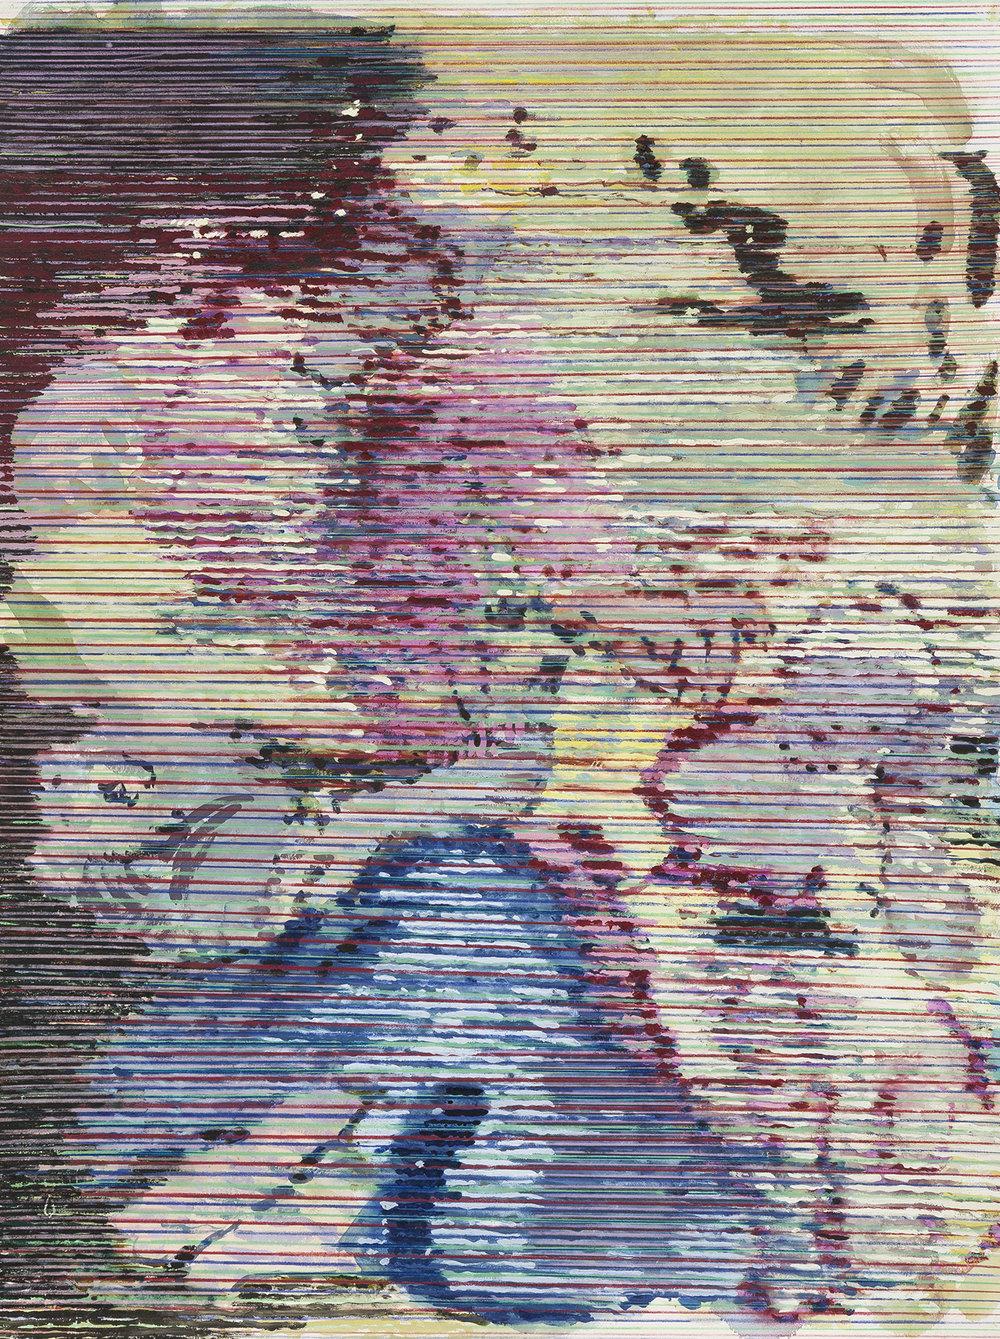 06.01.18 Delphine Hennelly-7.jpg